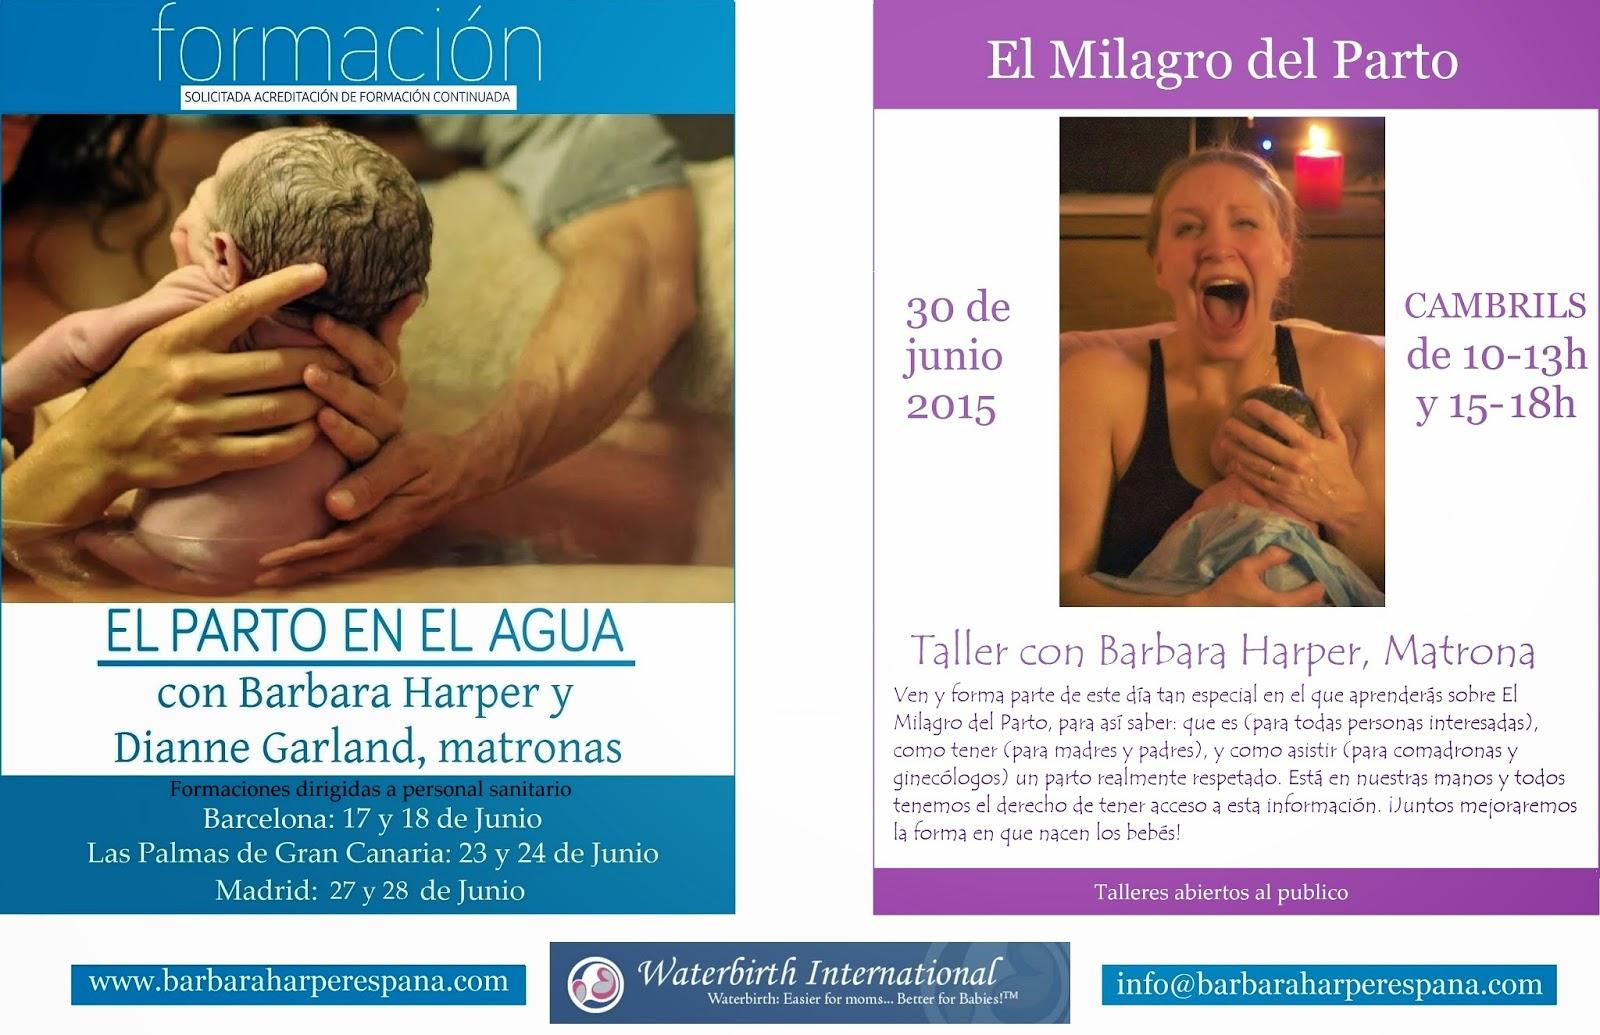 www.facebook.com/elpartoenelaguaconbarbaraharper